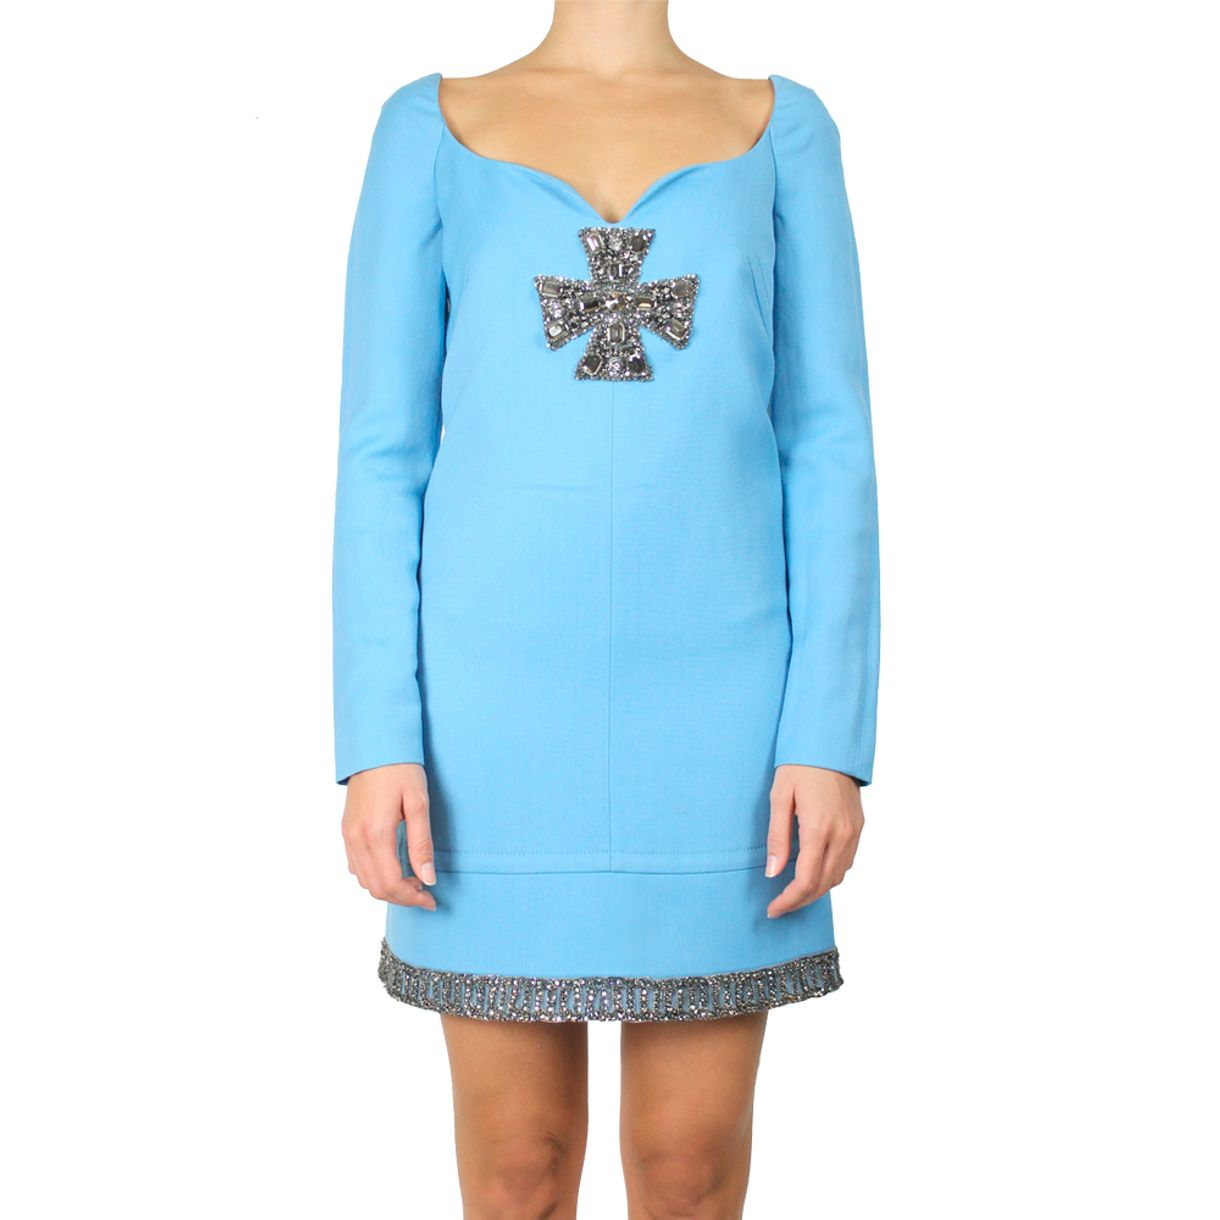 Vestido-Emilio-Pucci-Azul-Pedrarias